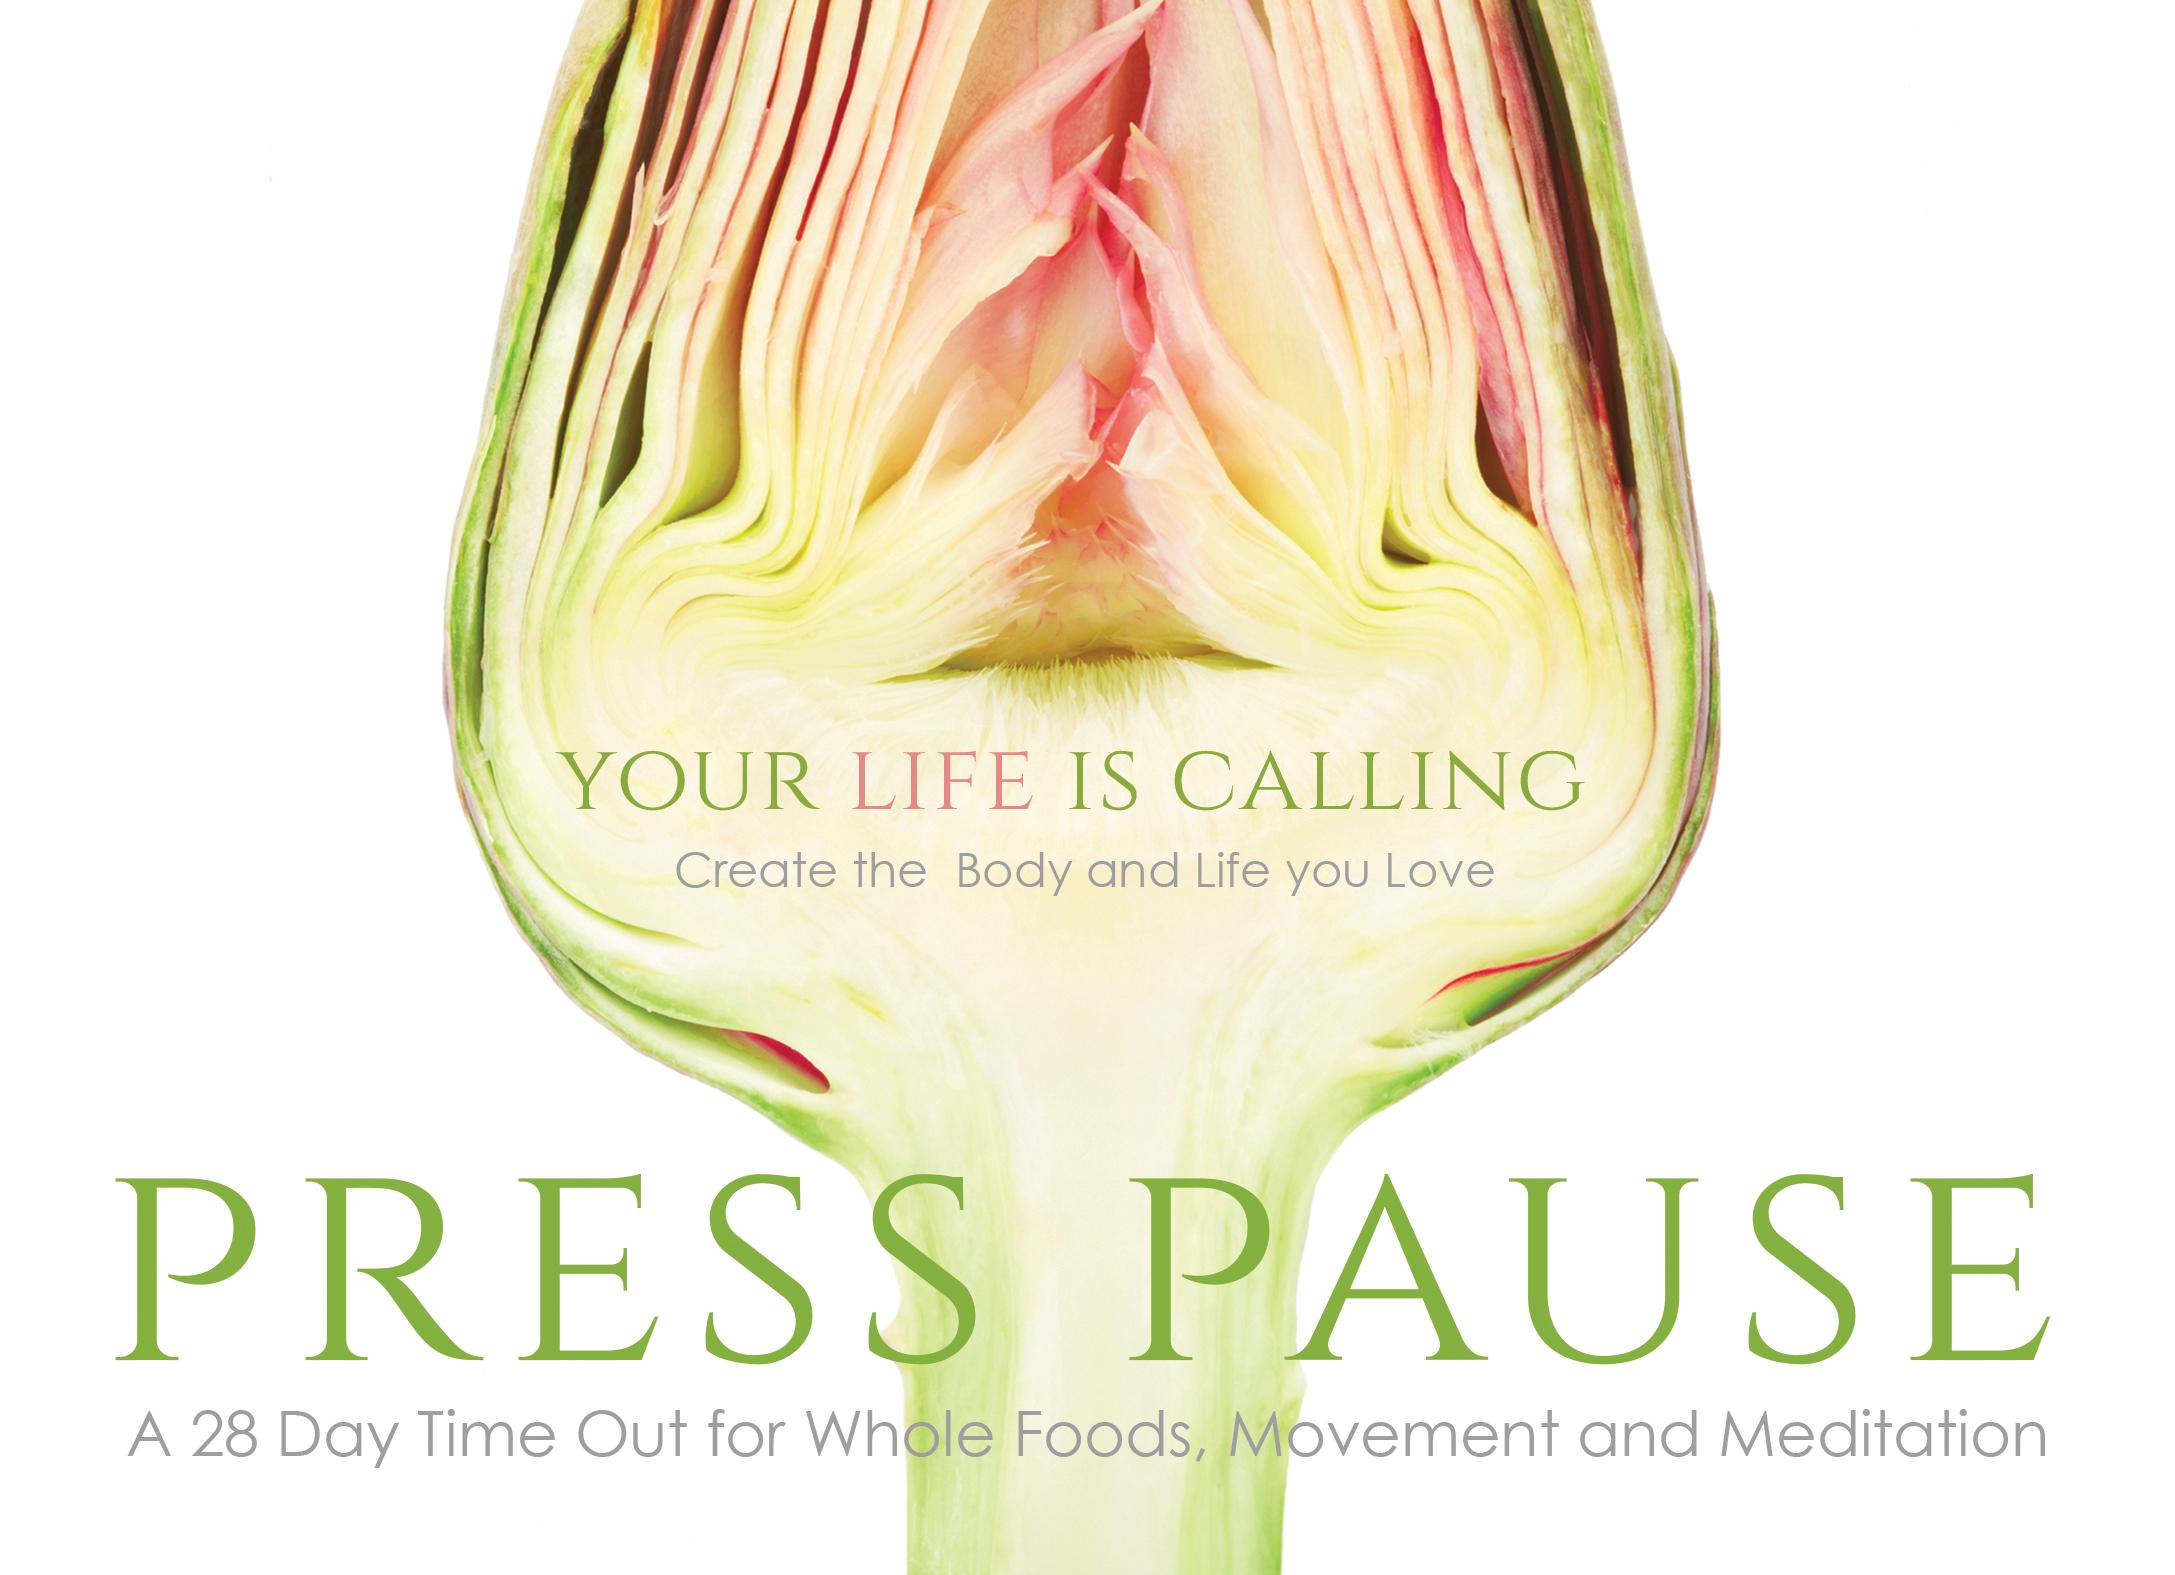 she paused press pause promo postcard rgb for portfolio © heather rhodes.jpg